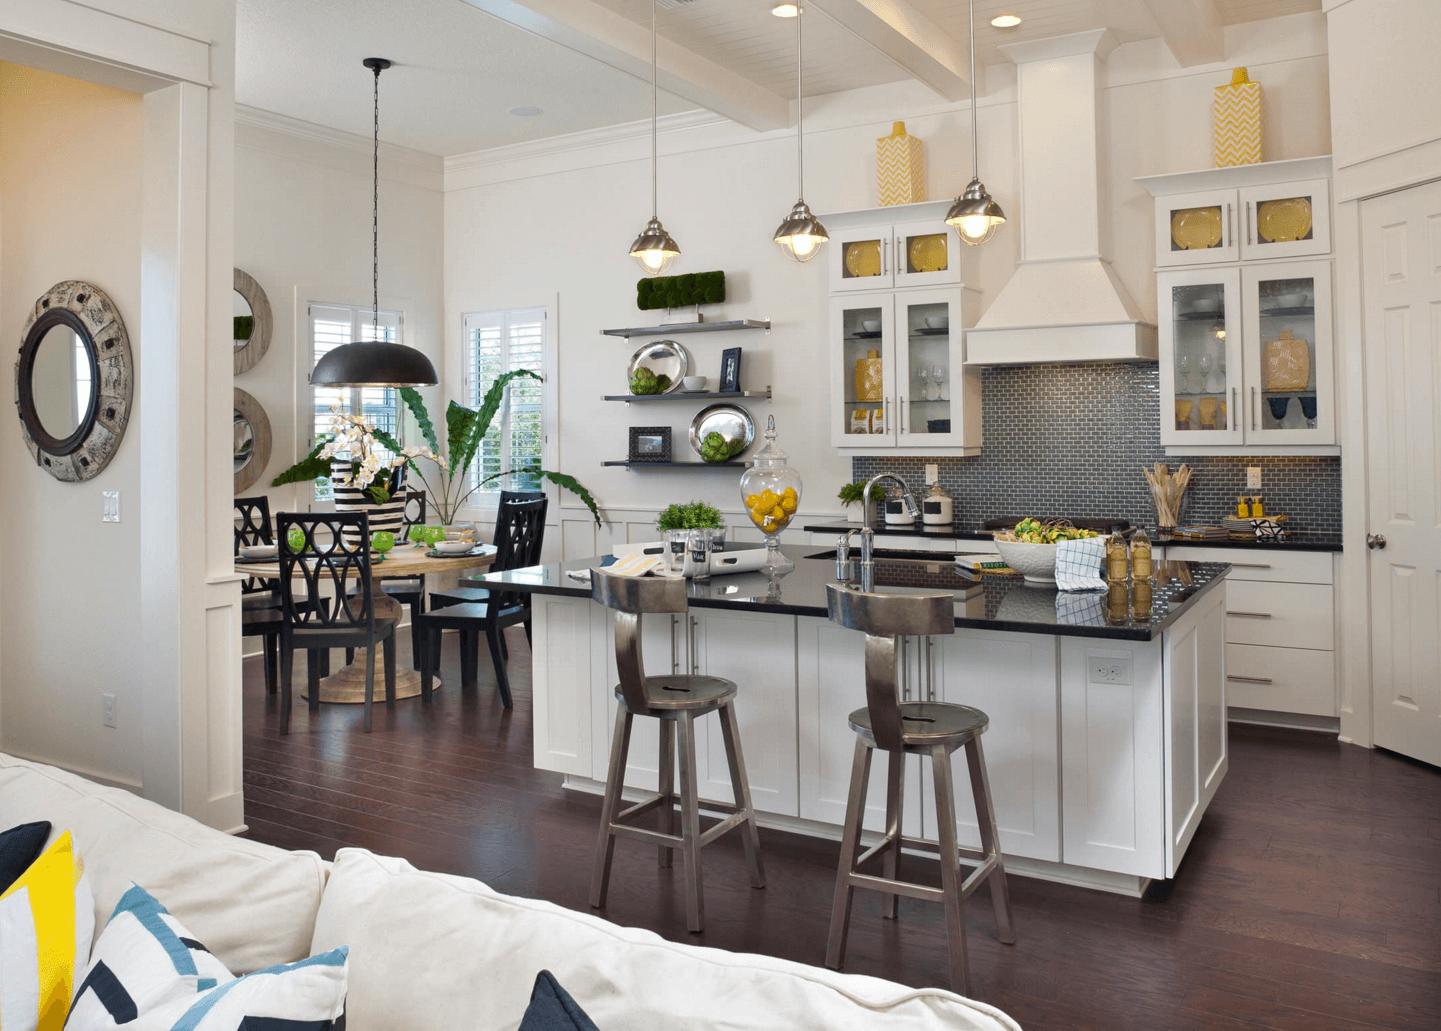 Идея дизайна фартука на кухню. Обновлённая кухня